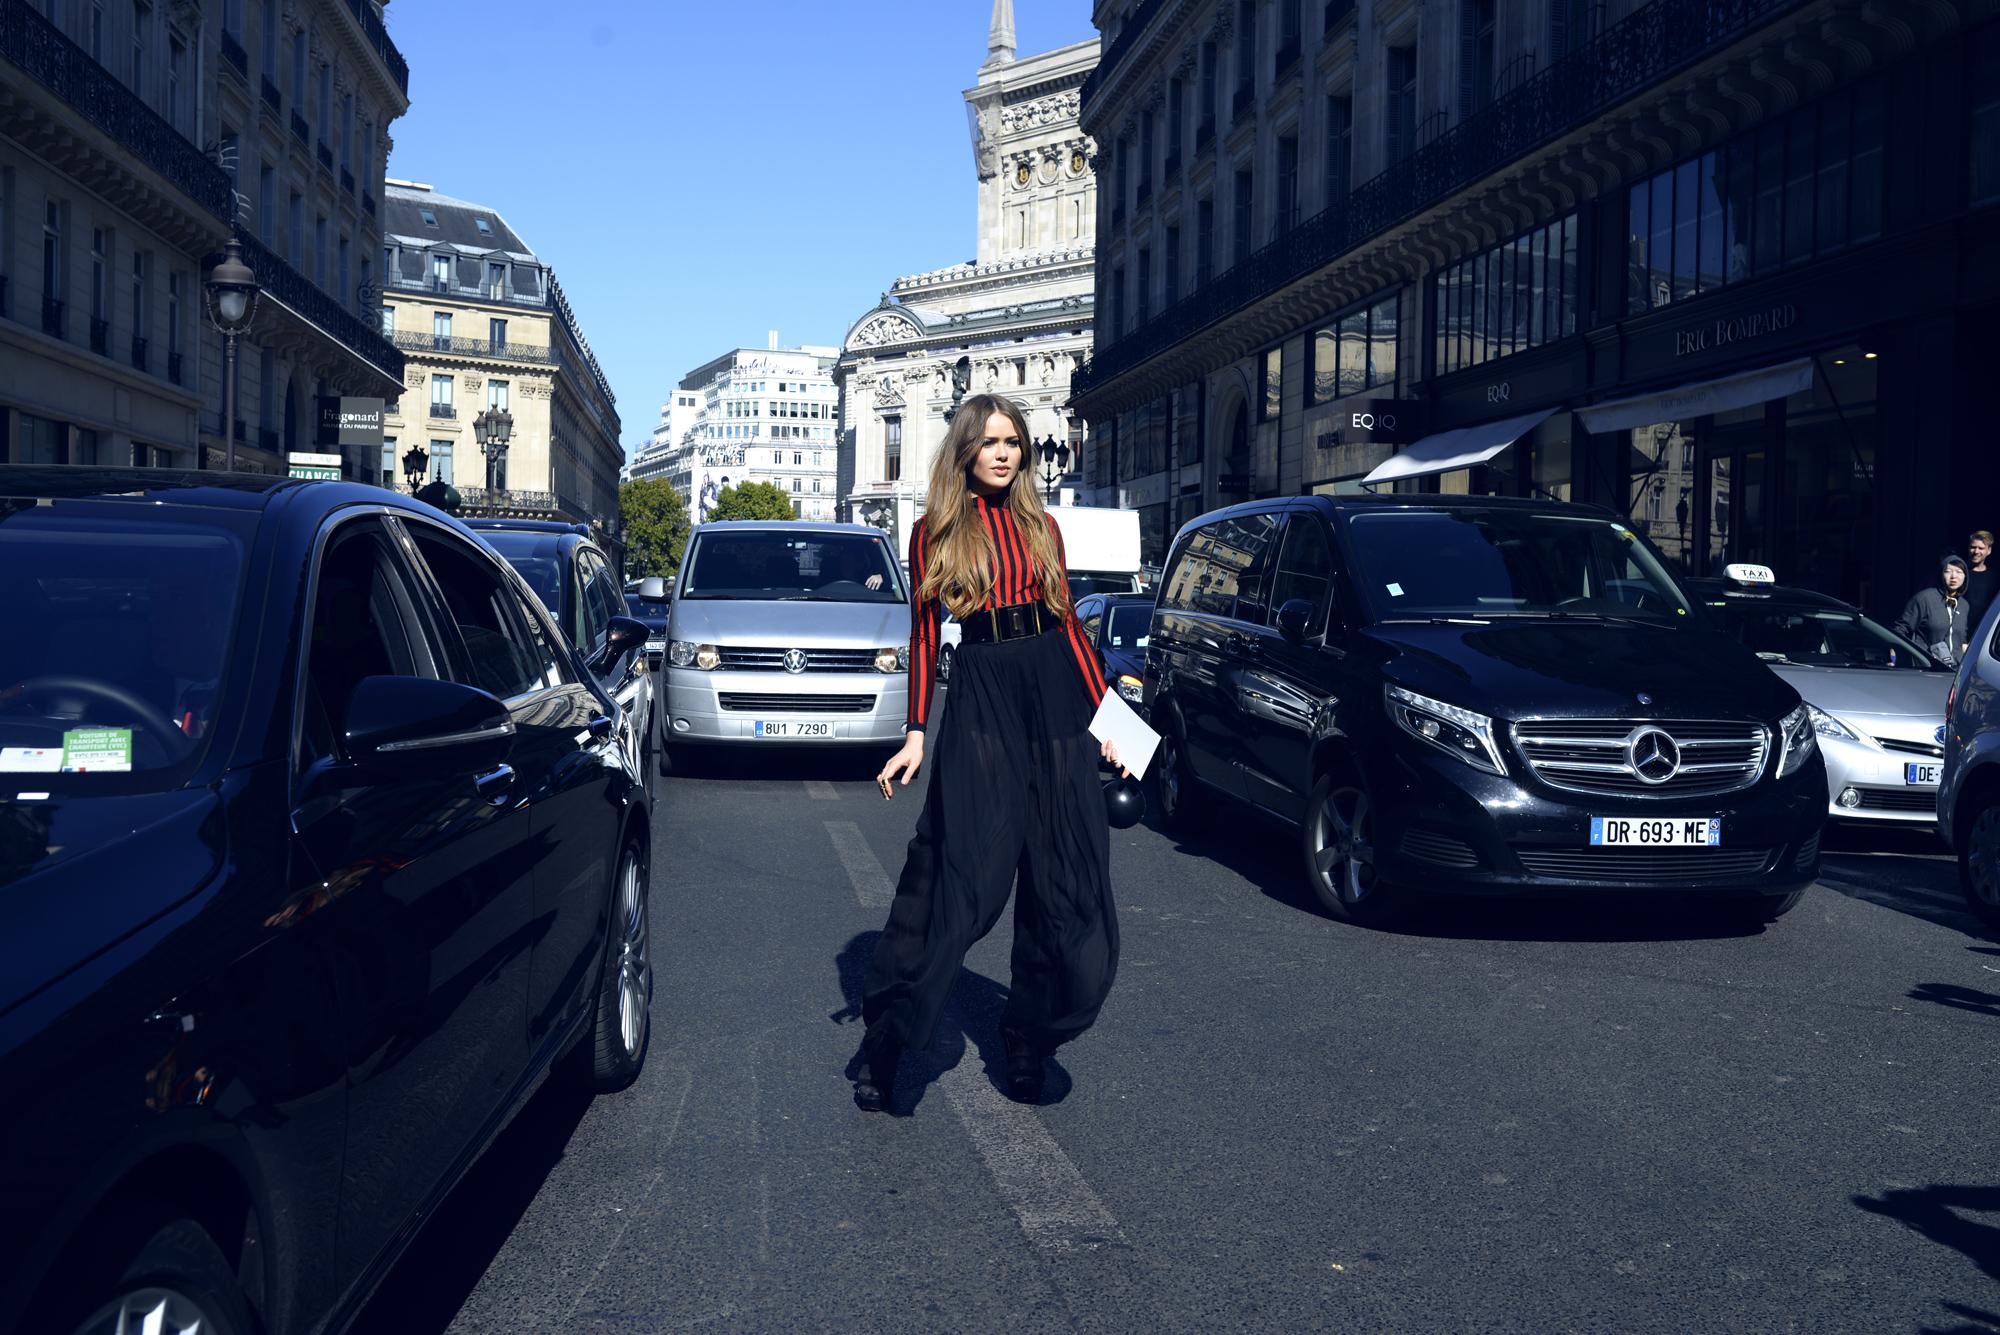 Cibelle x Kristina | L'OrealStreet_25